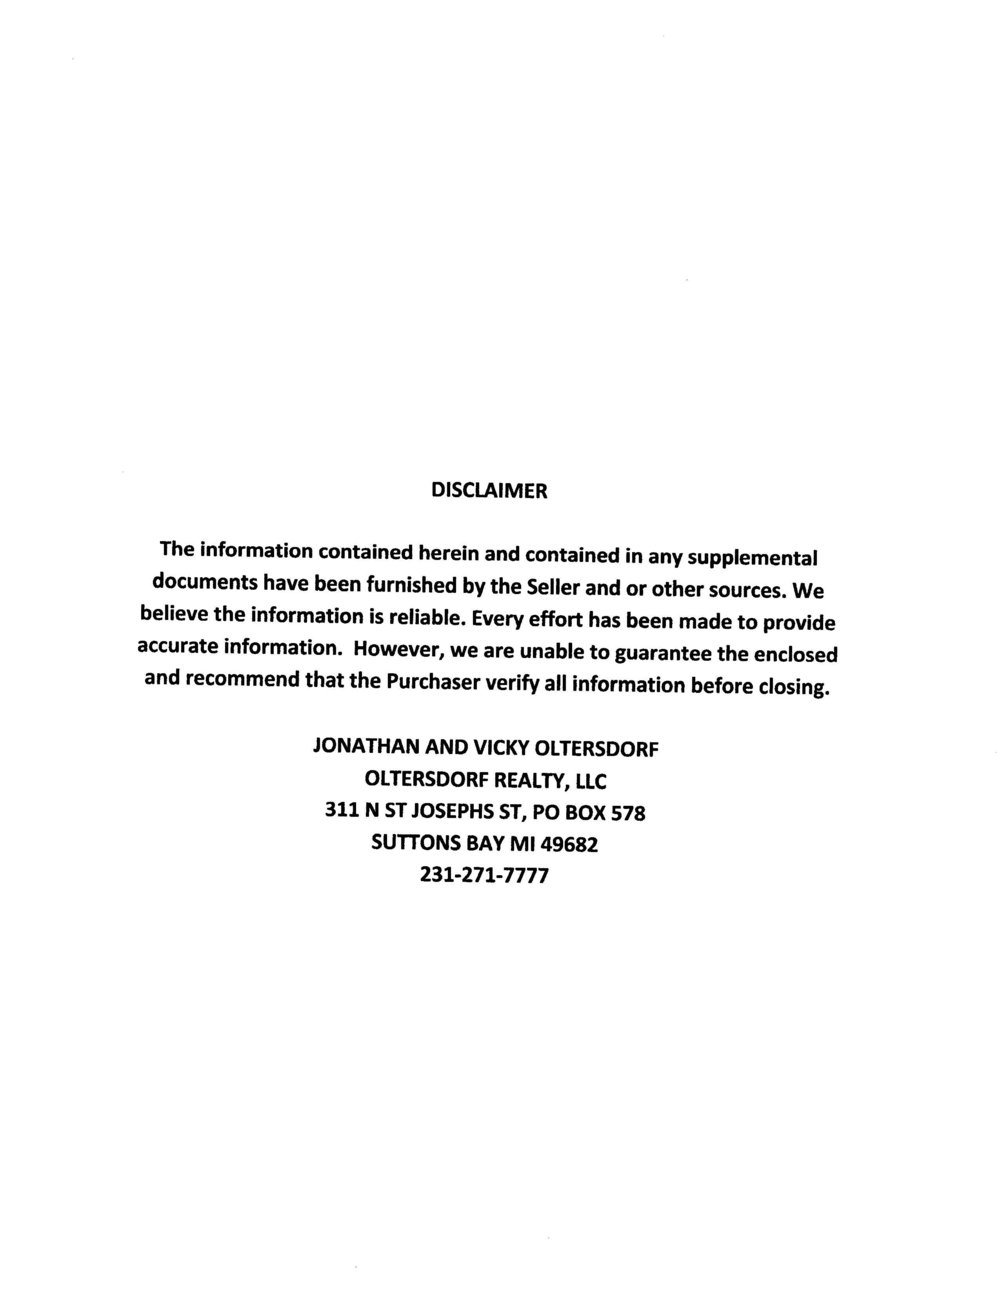 5500 E Hidden Beech, Cedar, MI - For sale by Oltersdorf Realty LLC - Marketing Packet (30).jpg